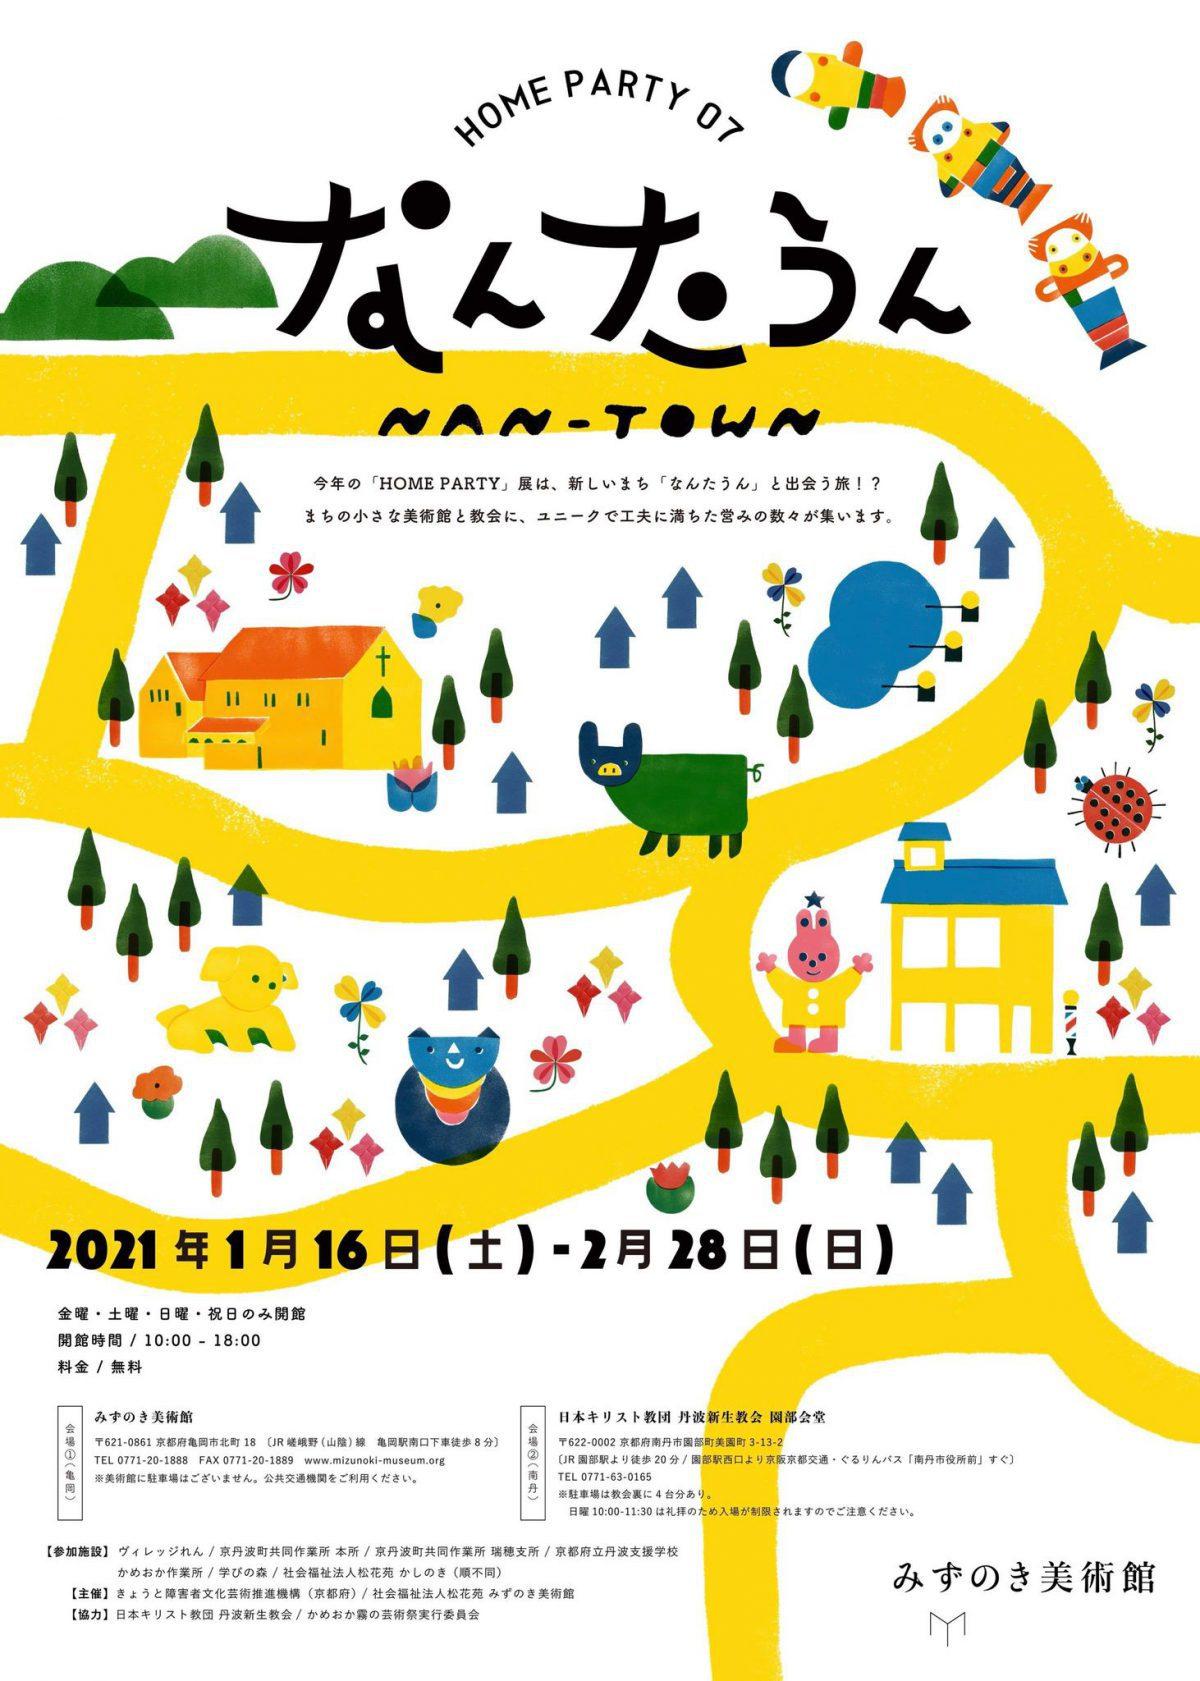 「HOME PARTY 07 -なんたうん-」展 対談を公開 テーマ「日常の中にあるアートを見つける・つなげる」 画像